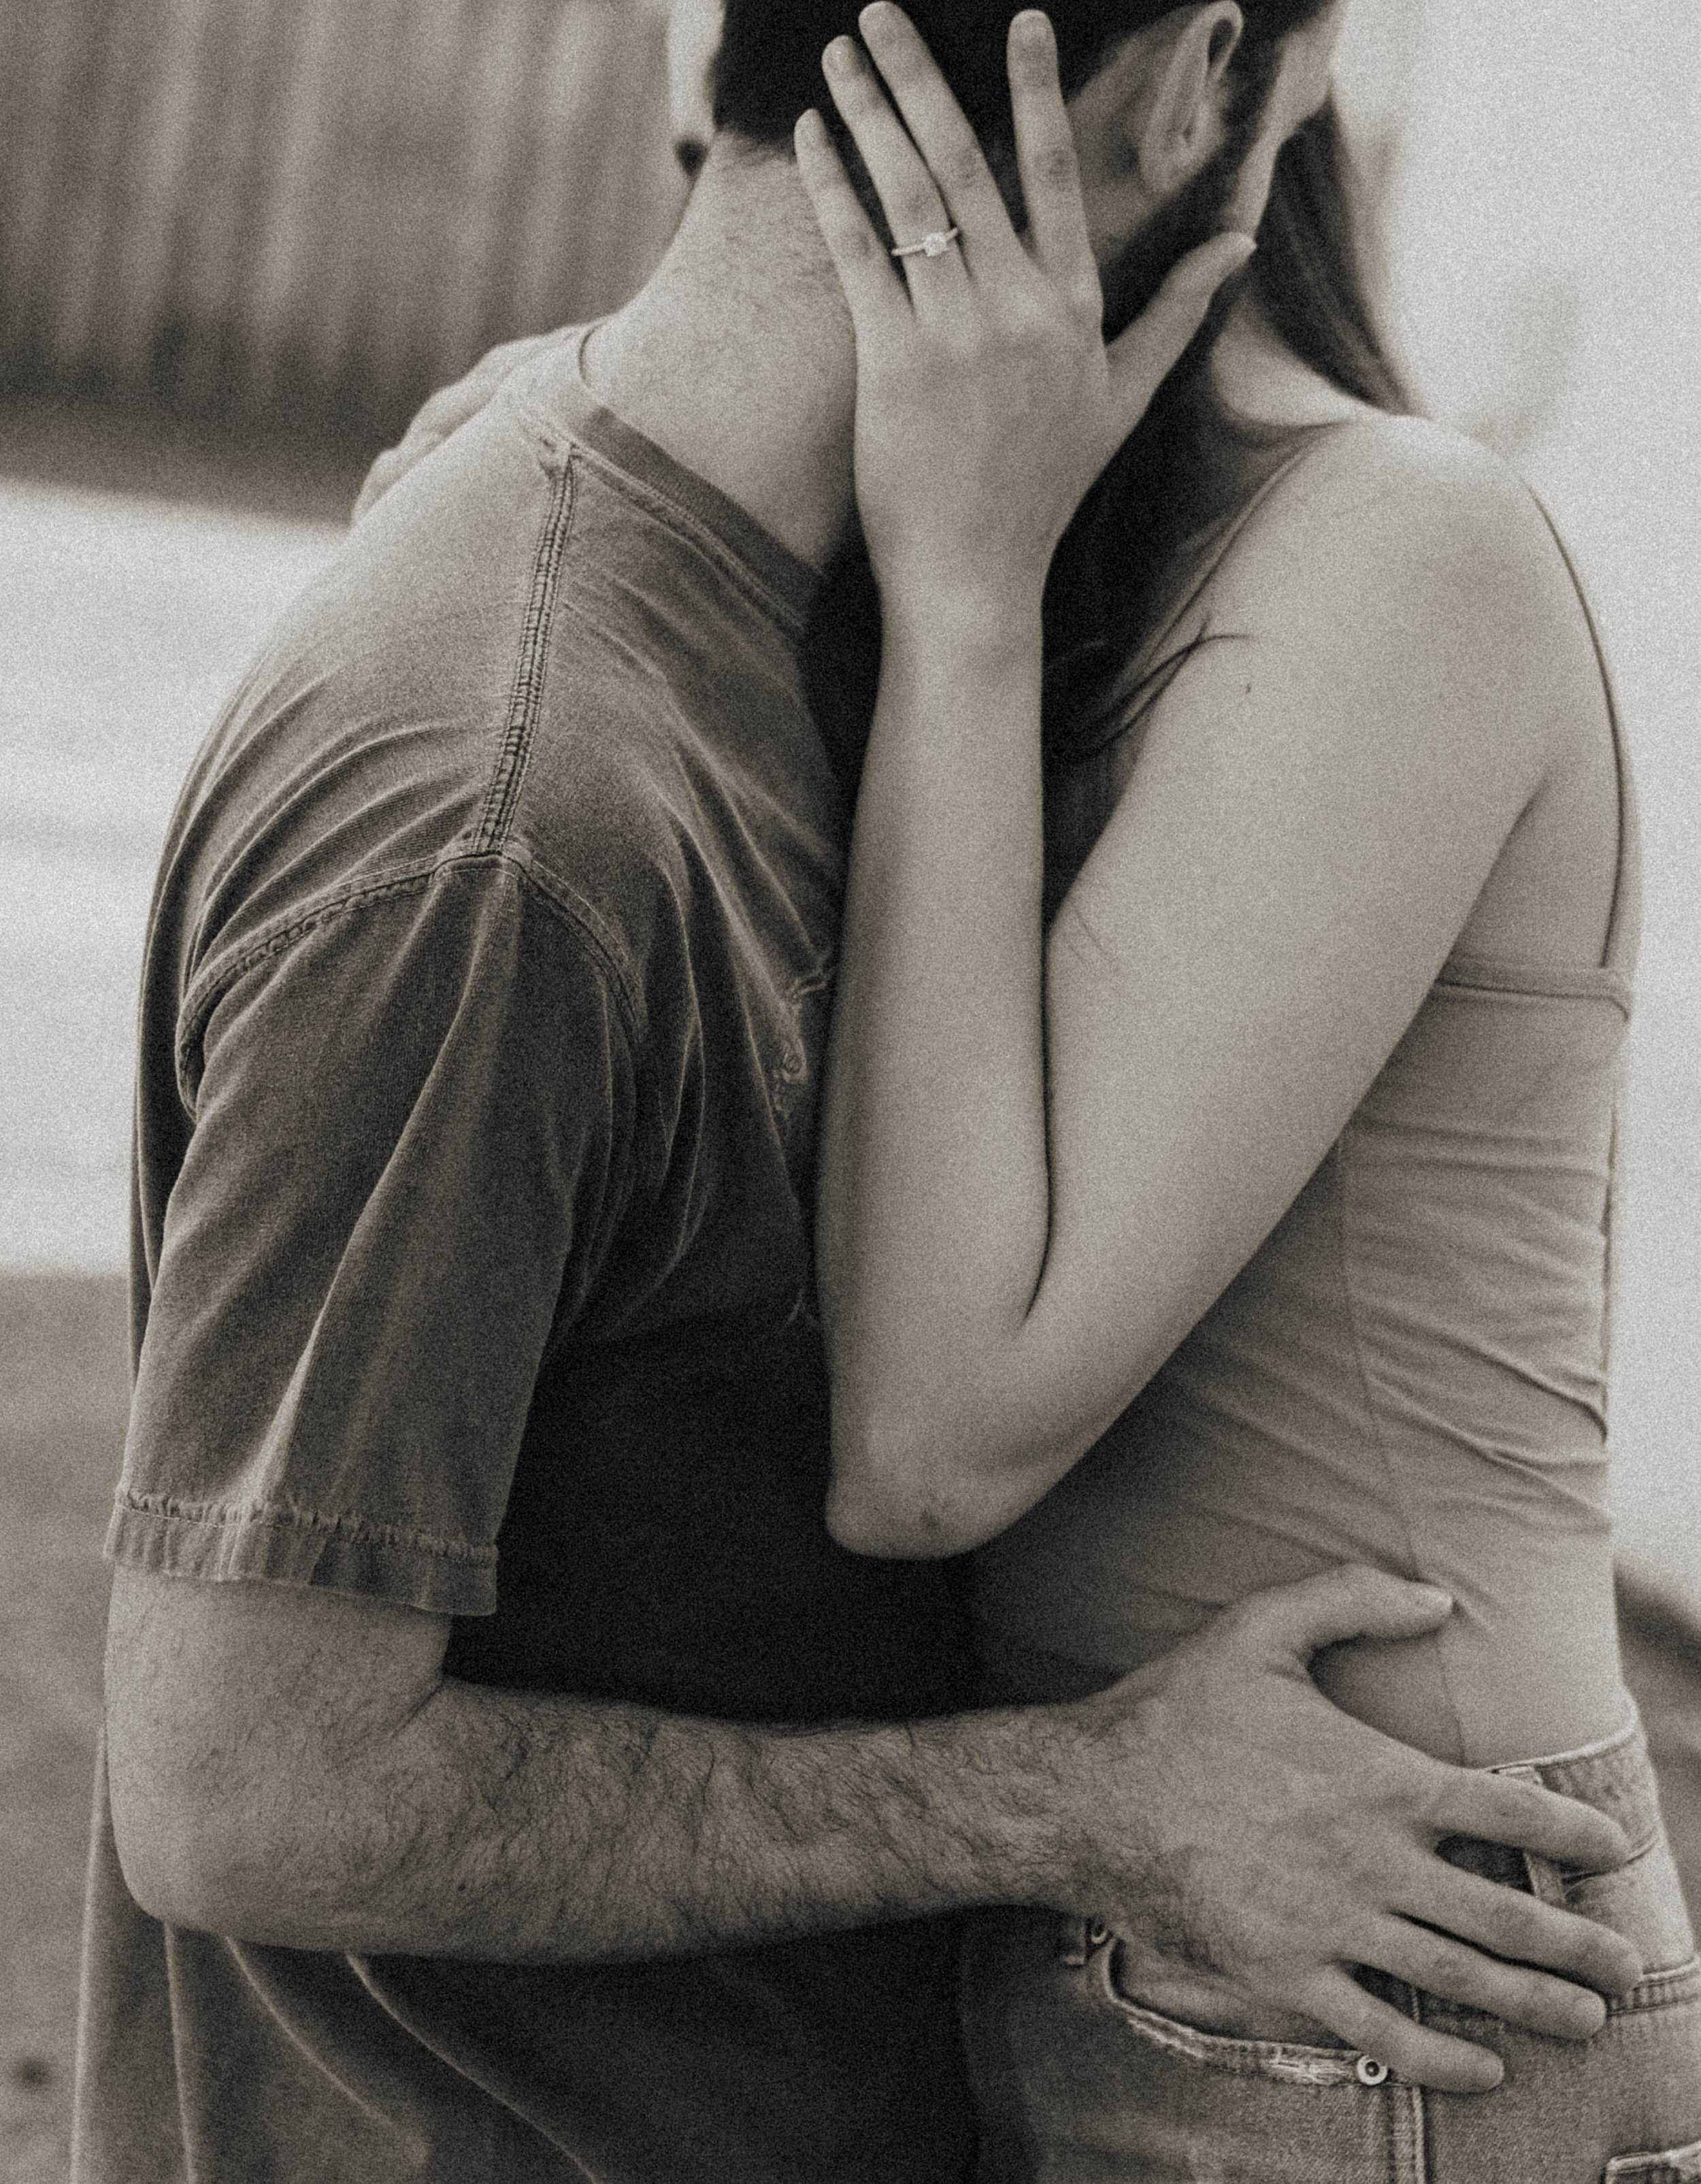 Intimate Engagement Photos | Melanie Zentmeyer | Central Florida Photographer